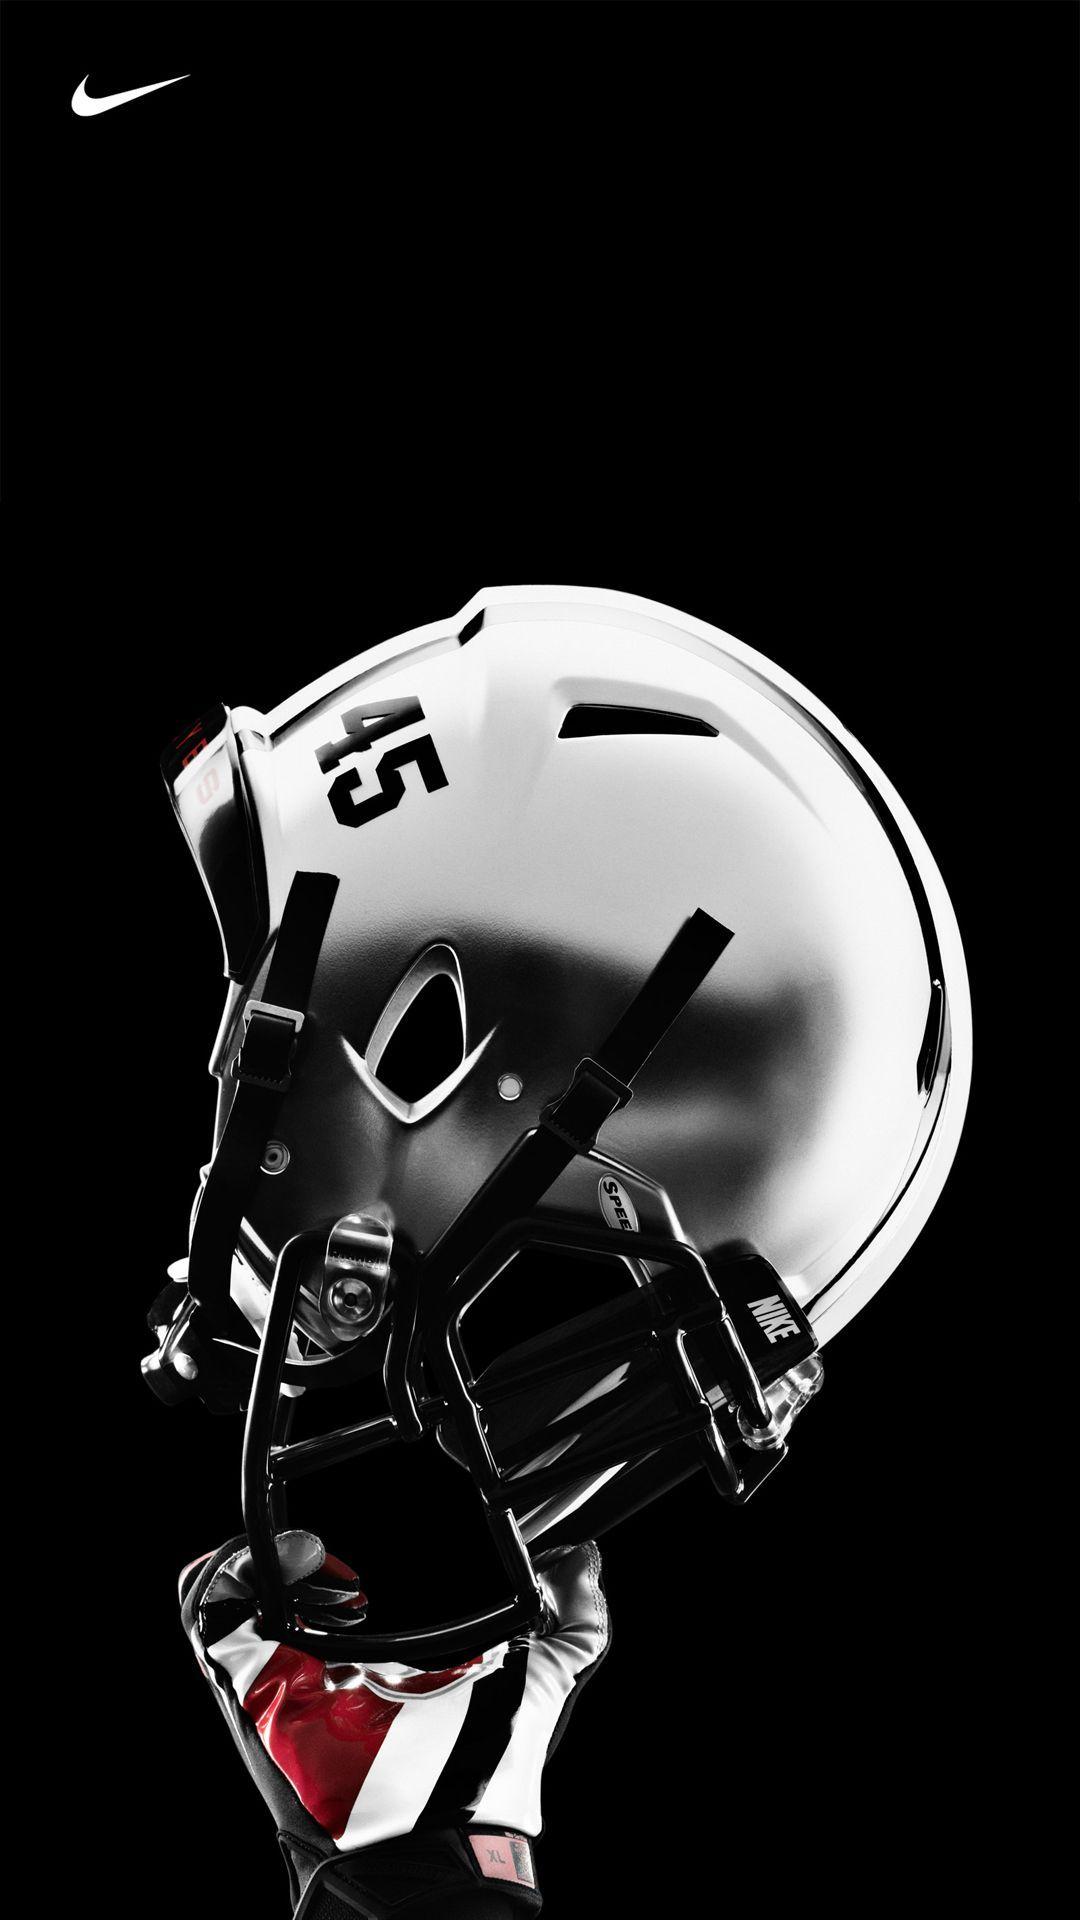 Black Oregon Ducks Wallpaper Mobile Football Wallpaper Iphone Football Wallpaper Ohio State Football